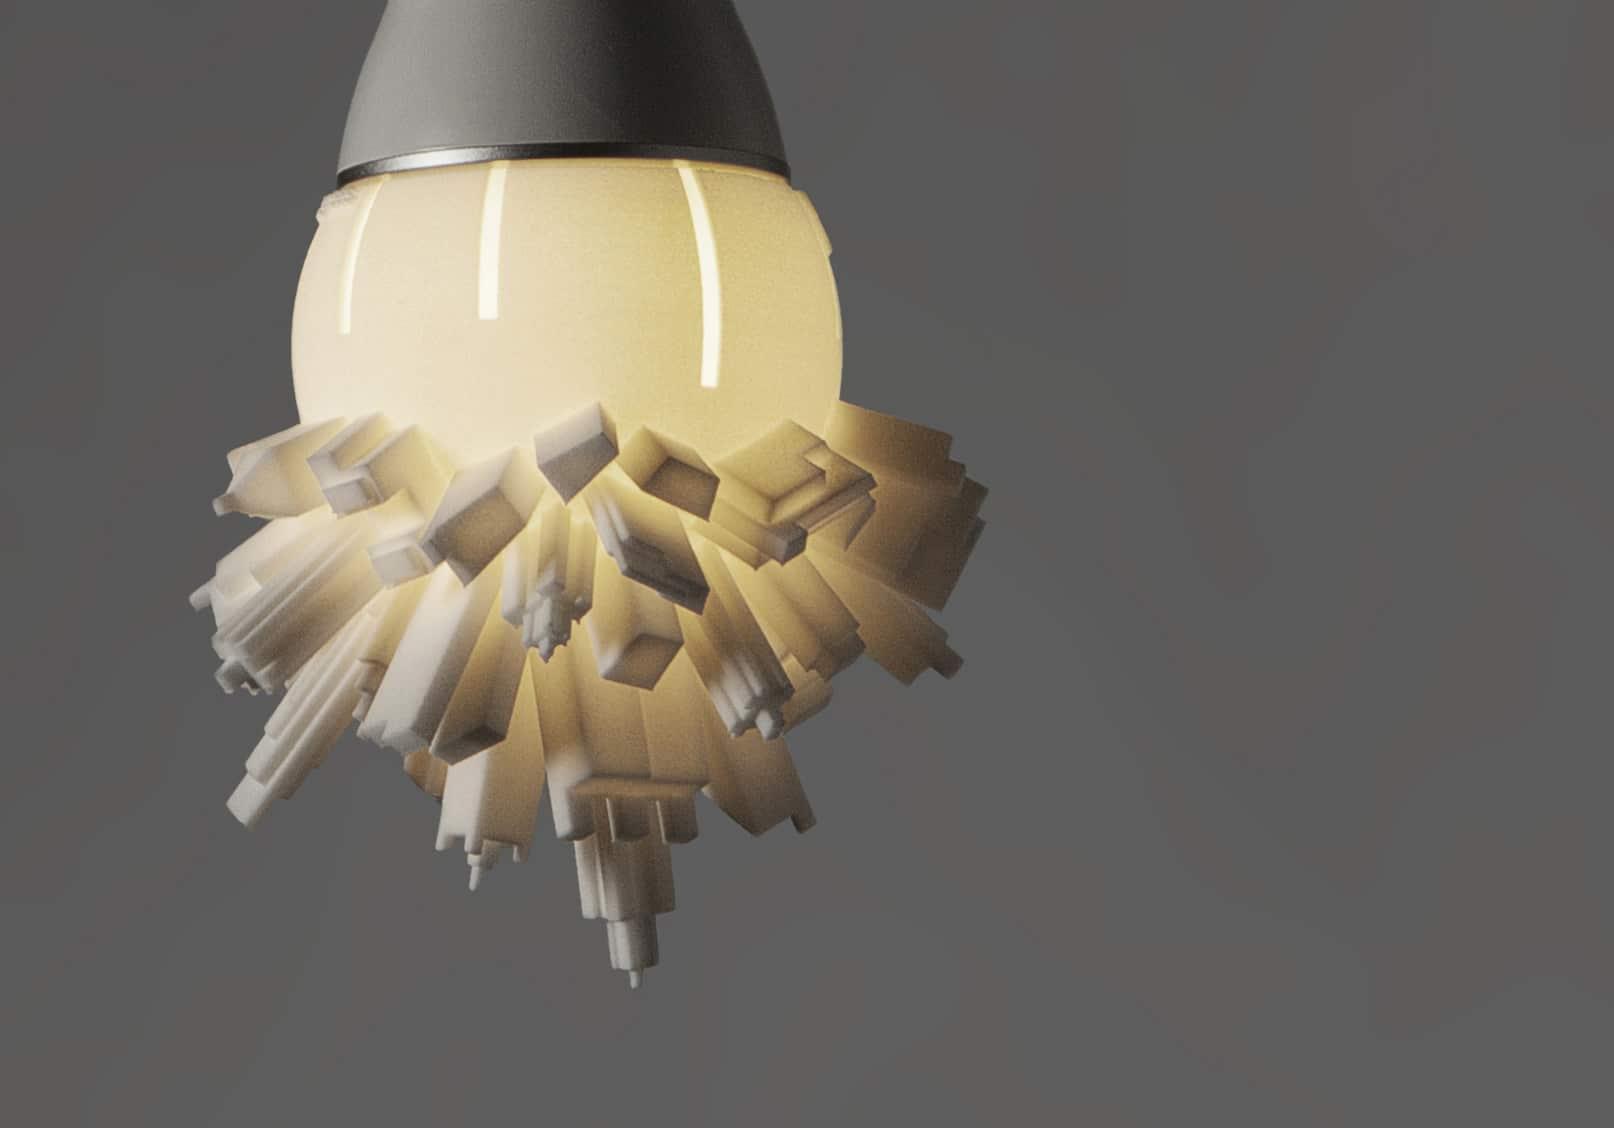 L mparas led 7 proyectos de luces leds que revolucionan - Lamparas que den mucha luz ...